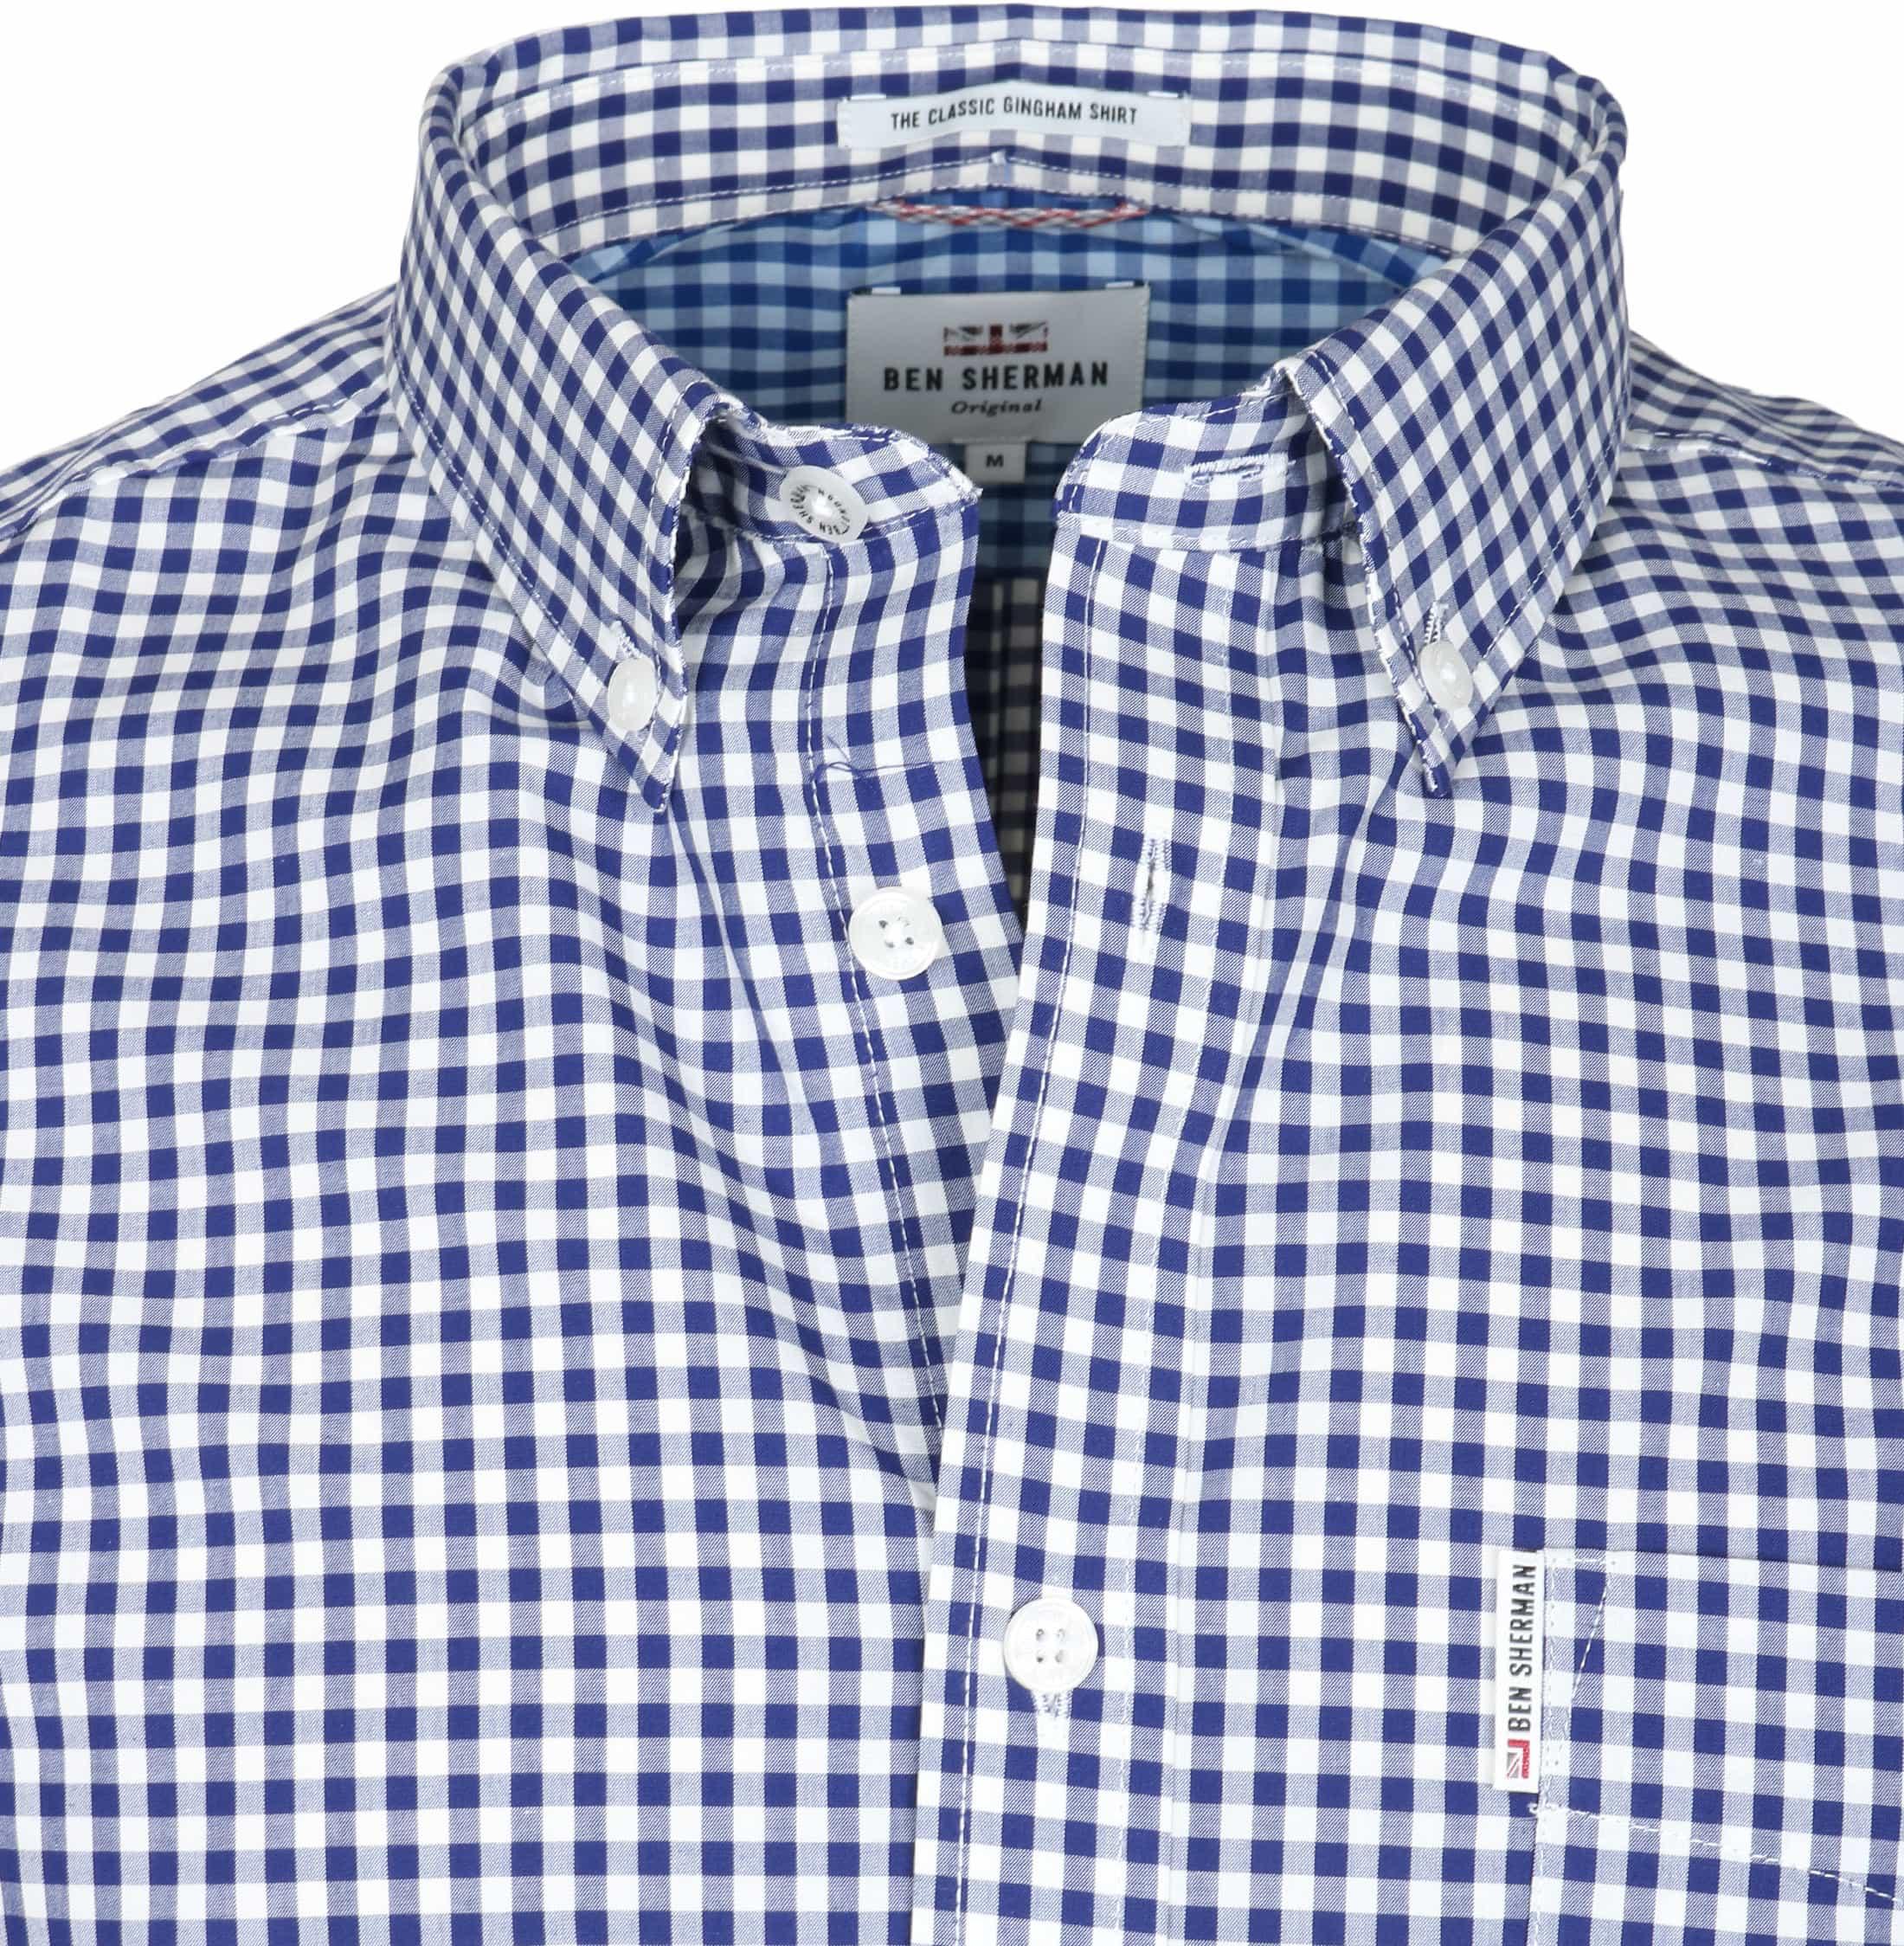 Ben Sherman Overhemd Ruit Donkerblauw foto 2